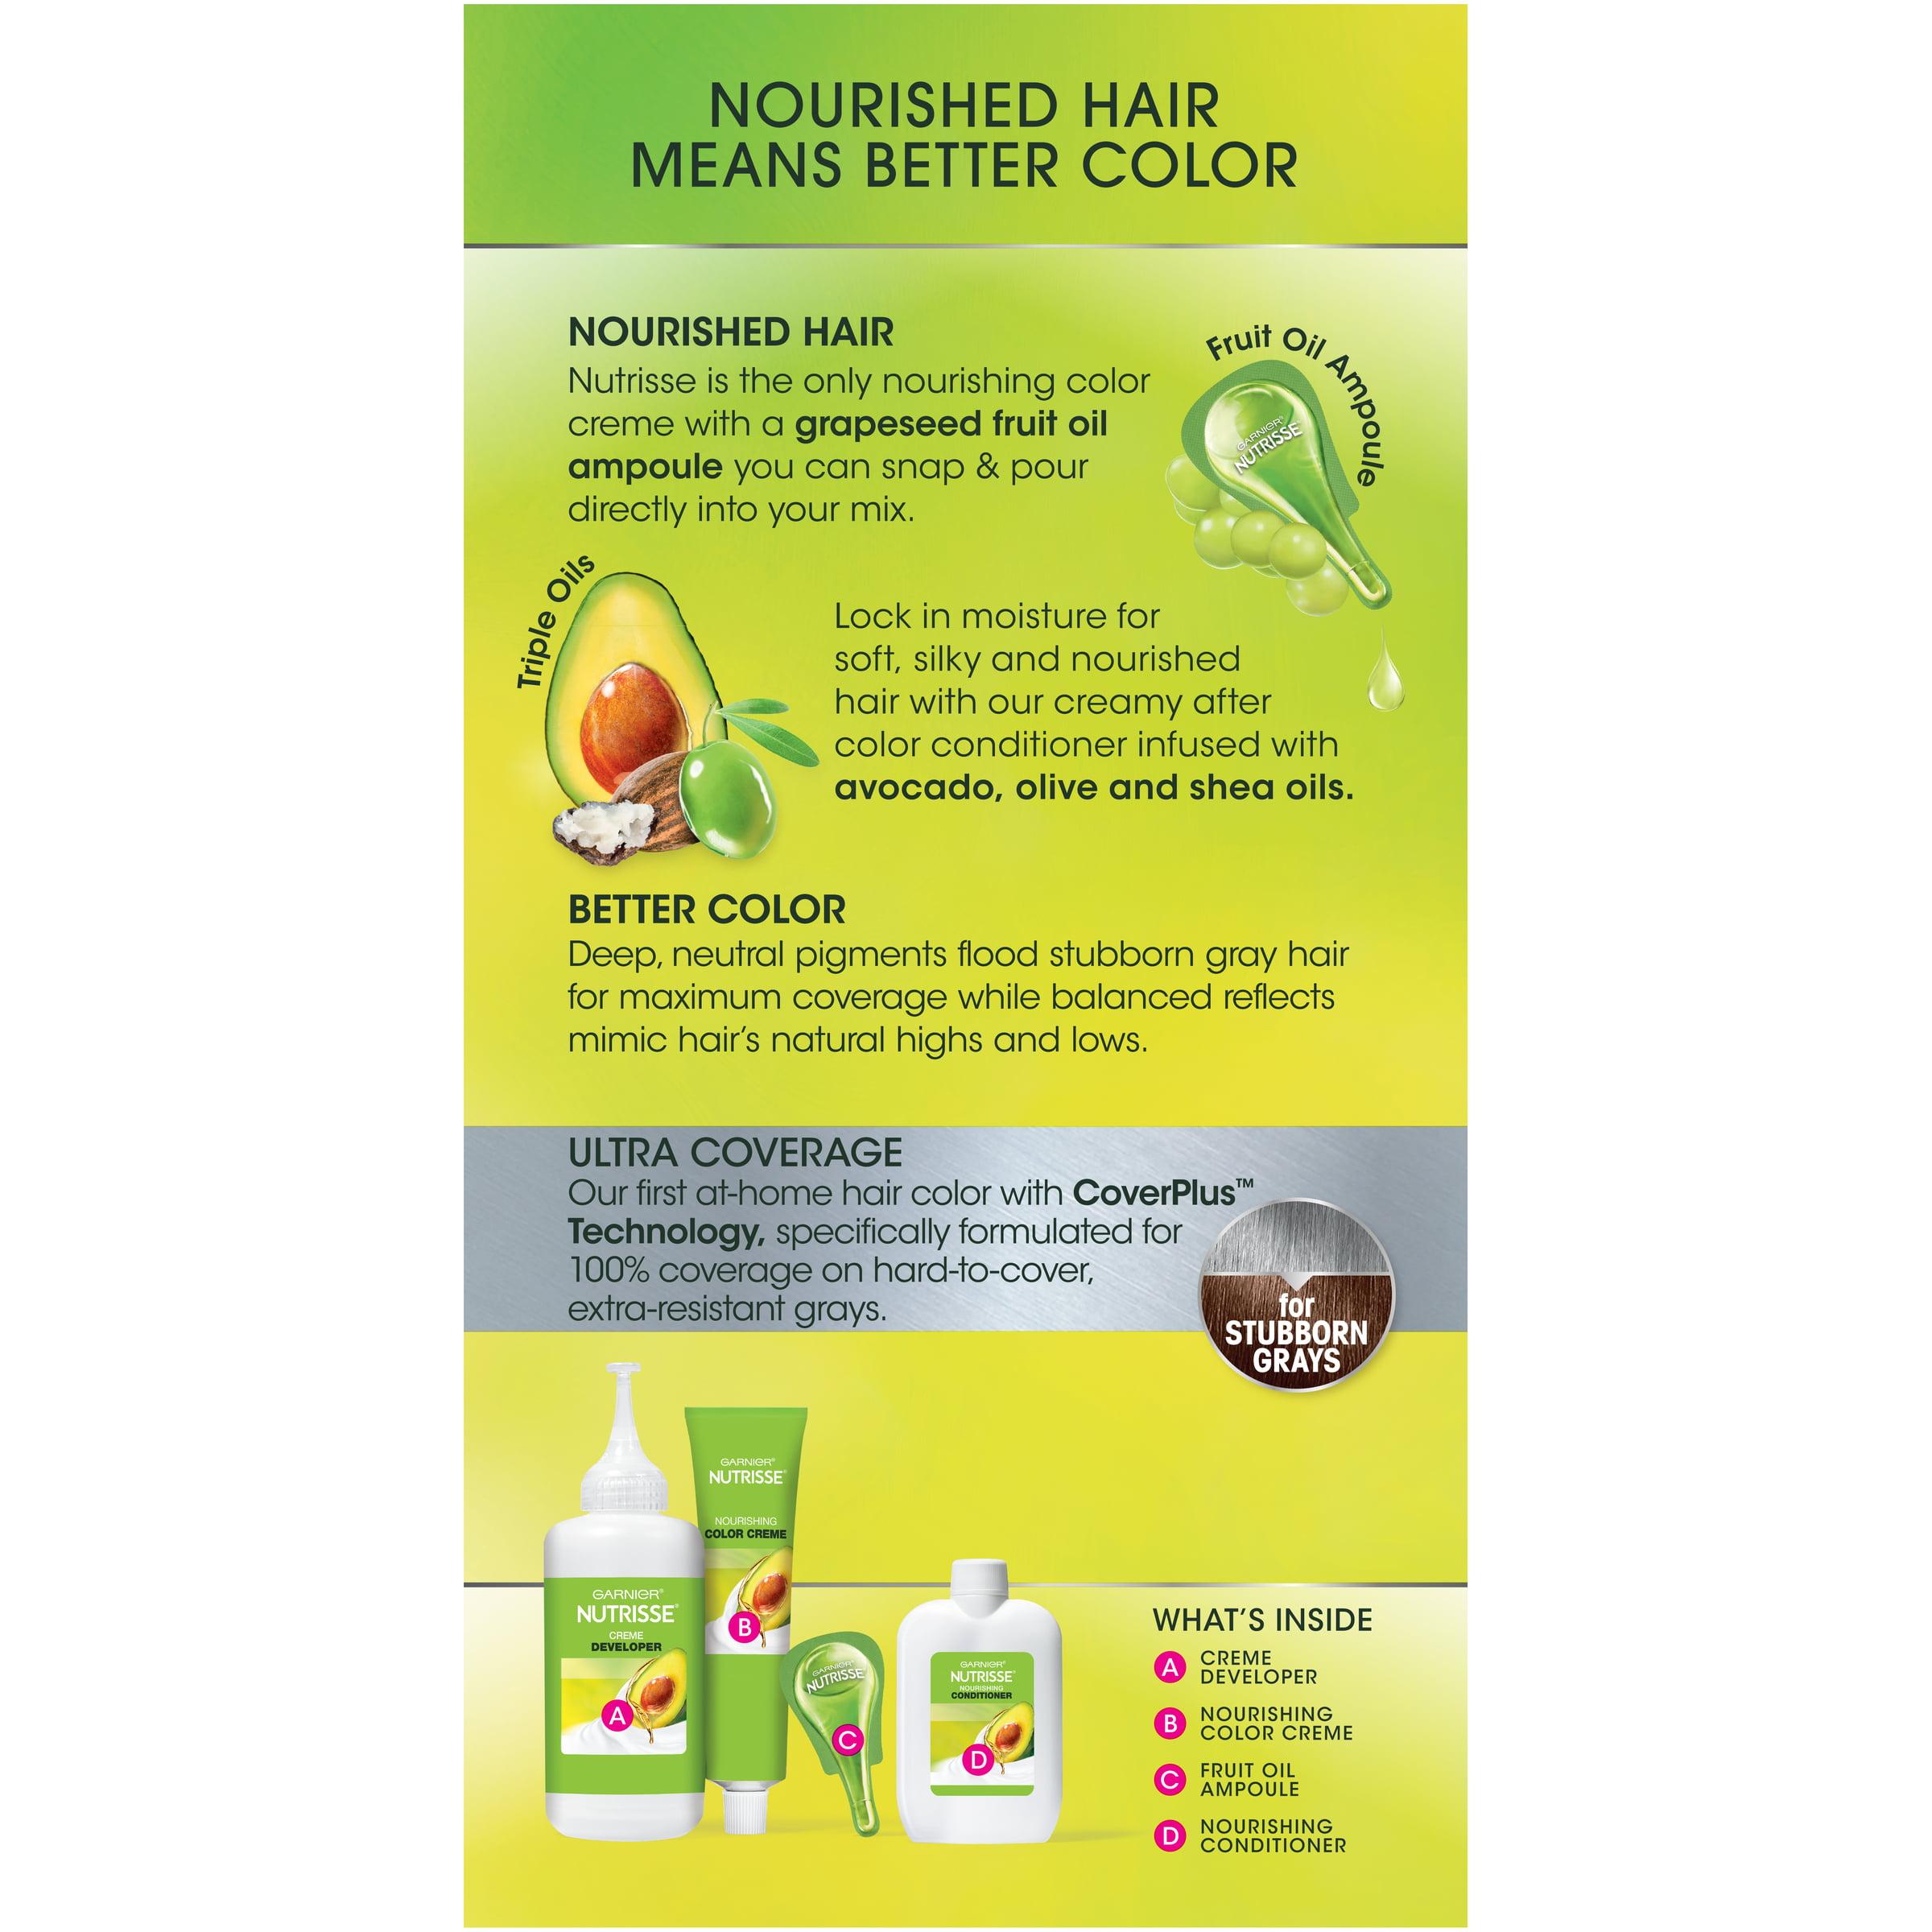 Garnier Nutrisse Ultra Coverage Hair Color - Walmart.com